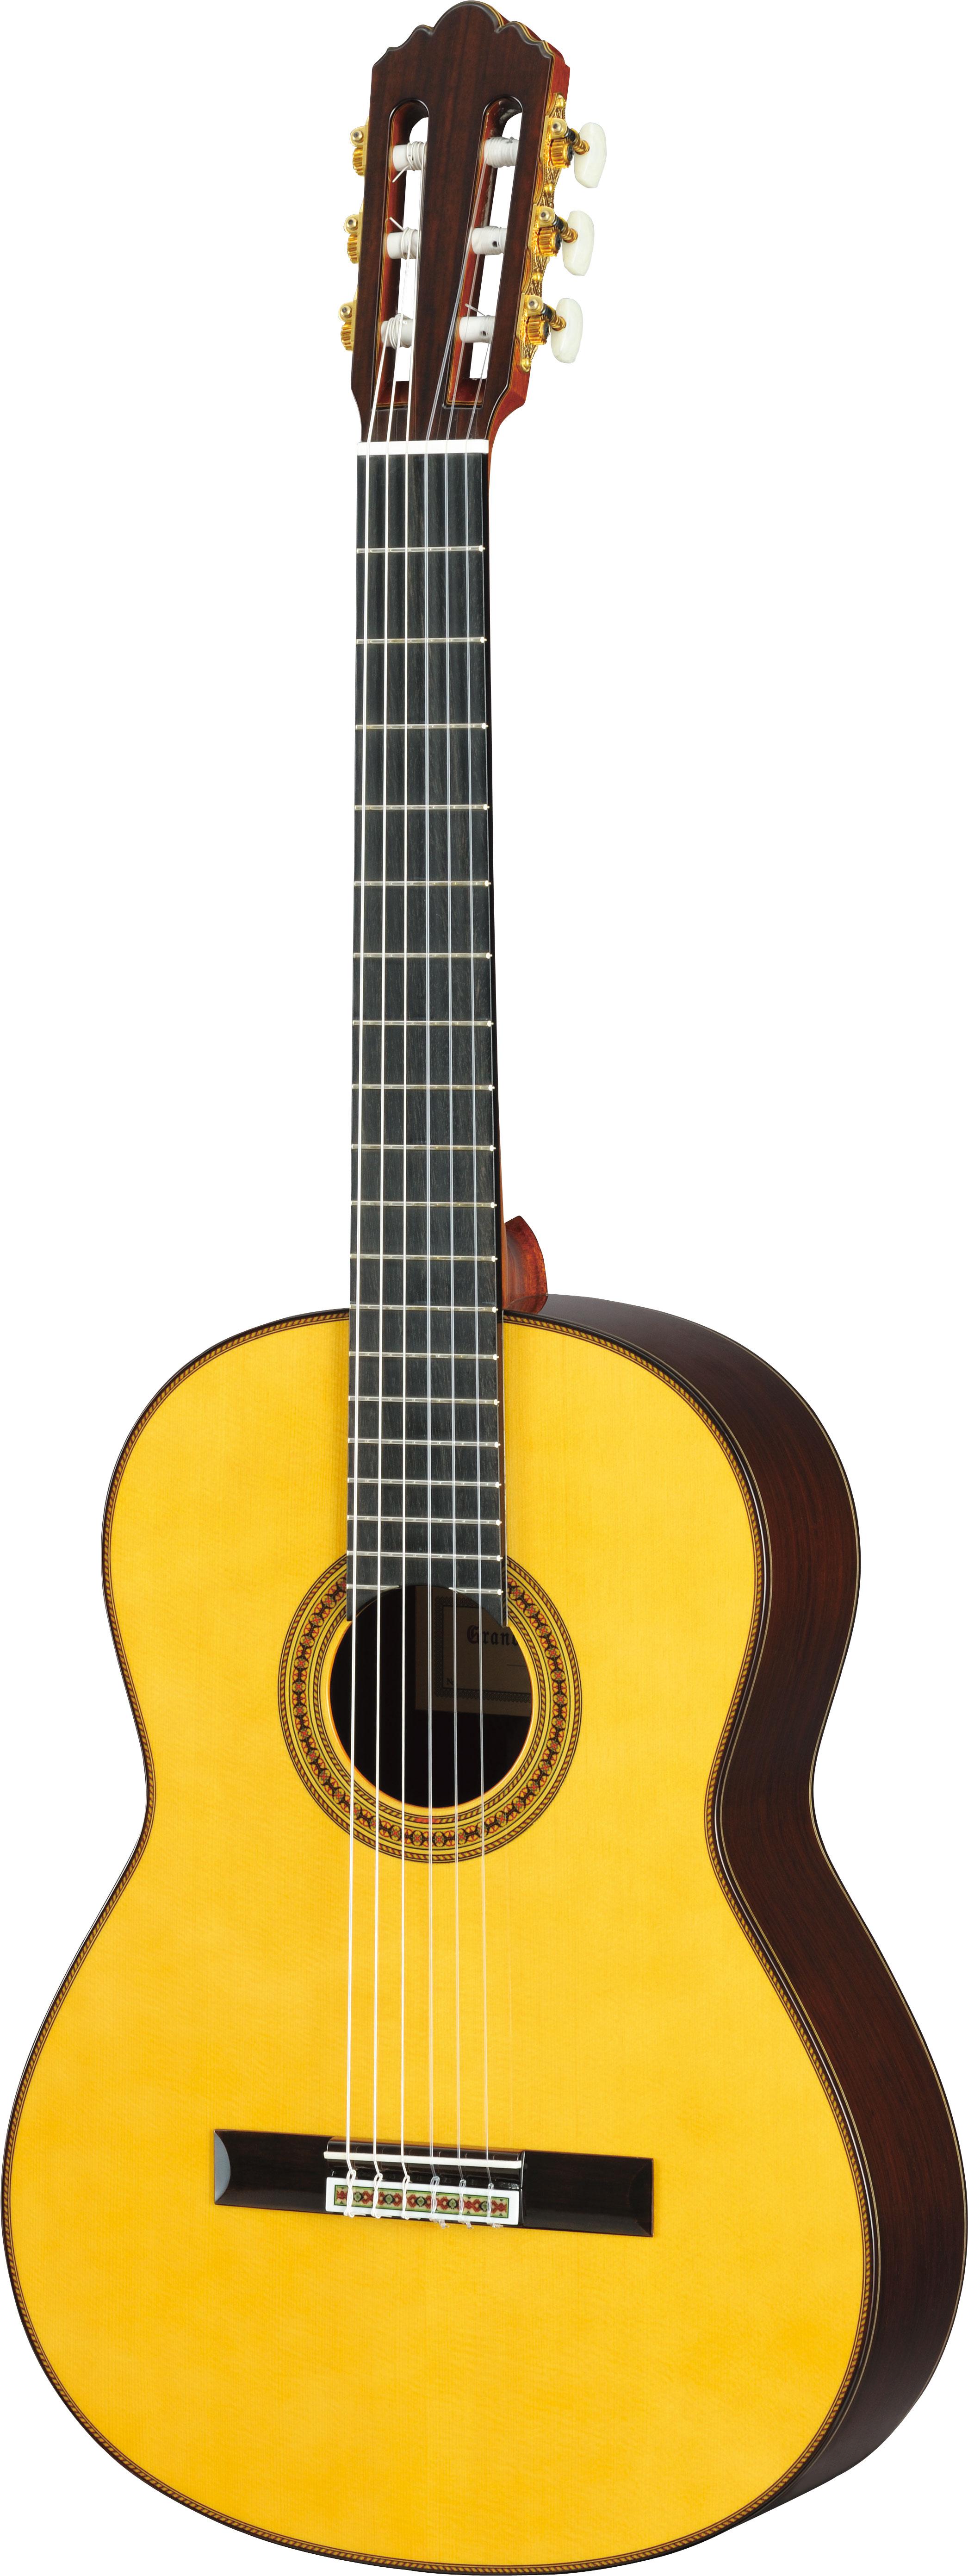 acoustic guitars buy best acoustic brands martin yahama ibanez takamine fender. Black Bedroom Furniture Sets. Home Design Ideas